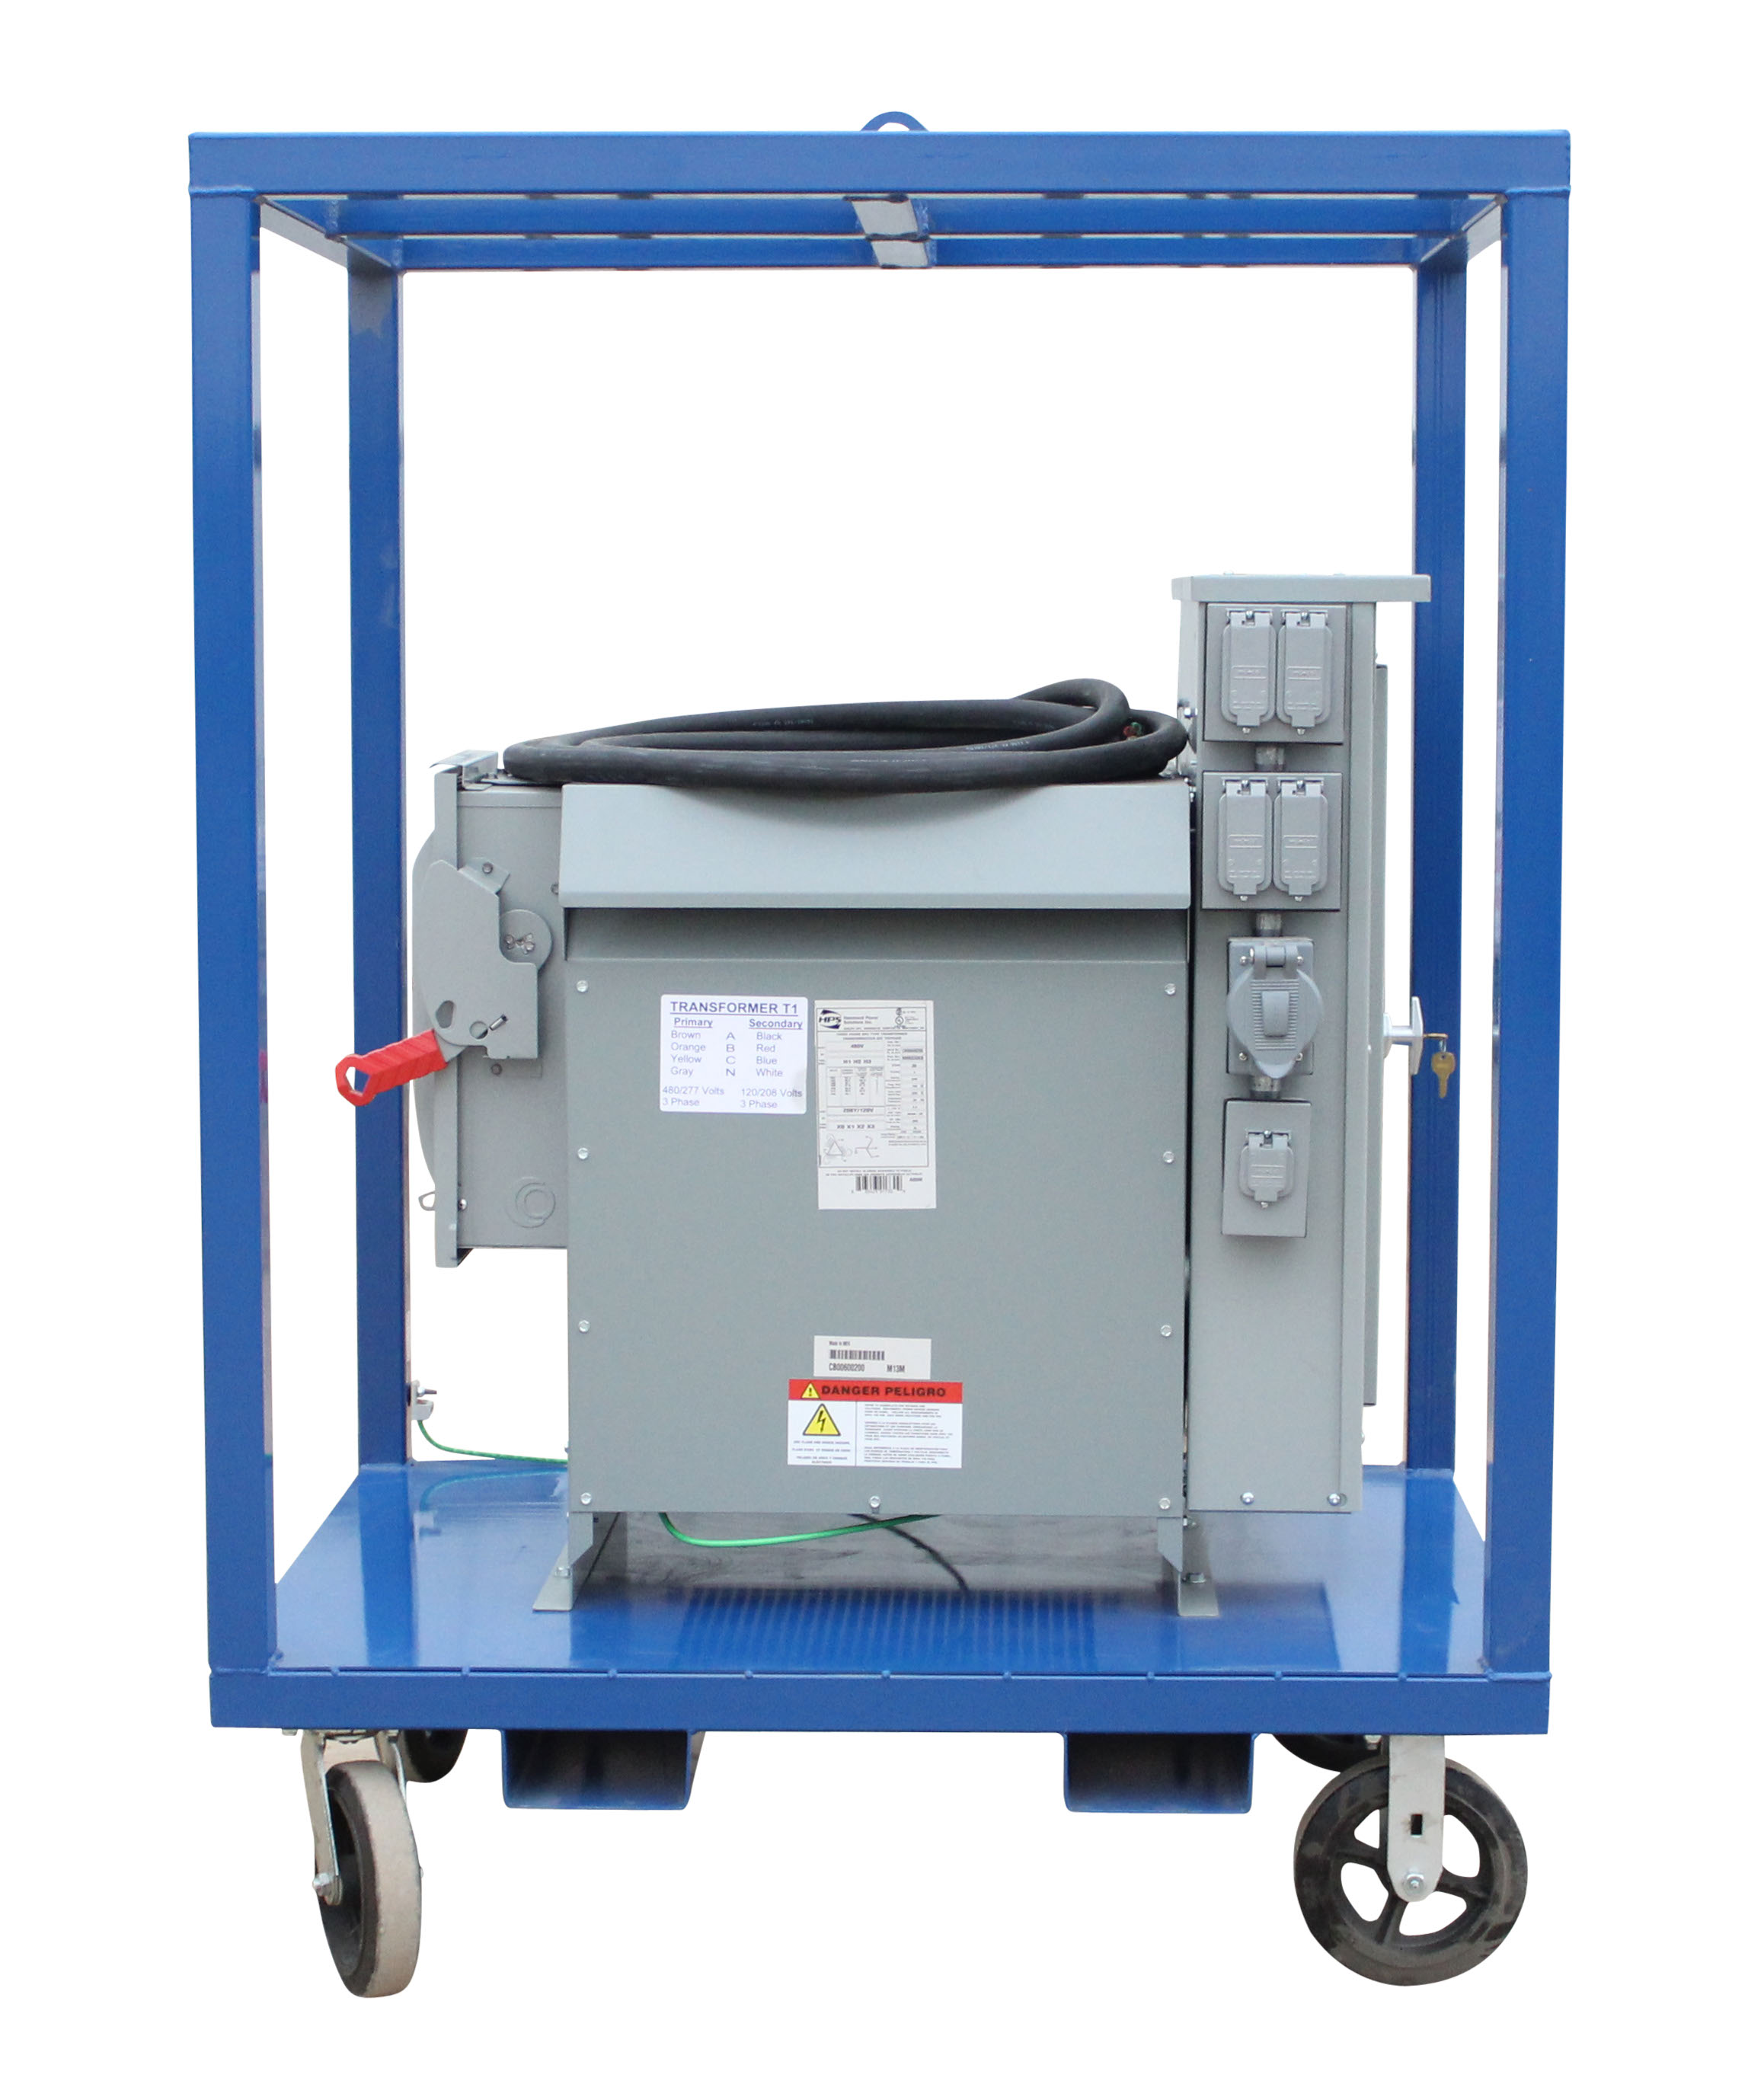 Larson Electronics Releases Heavy Duty 45 KVA Power Distribution